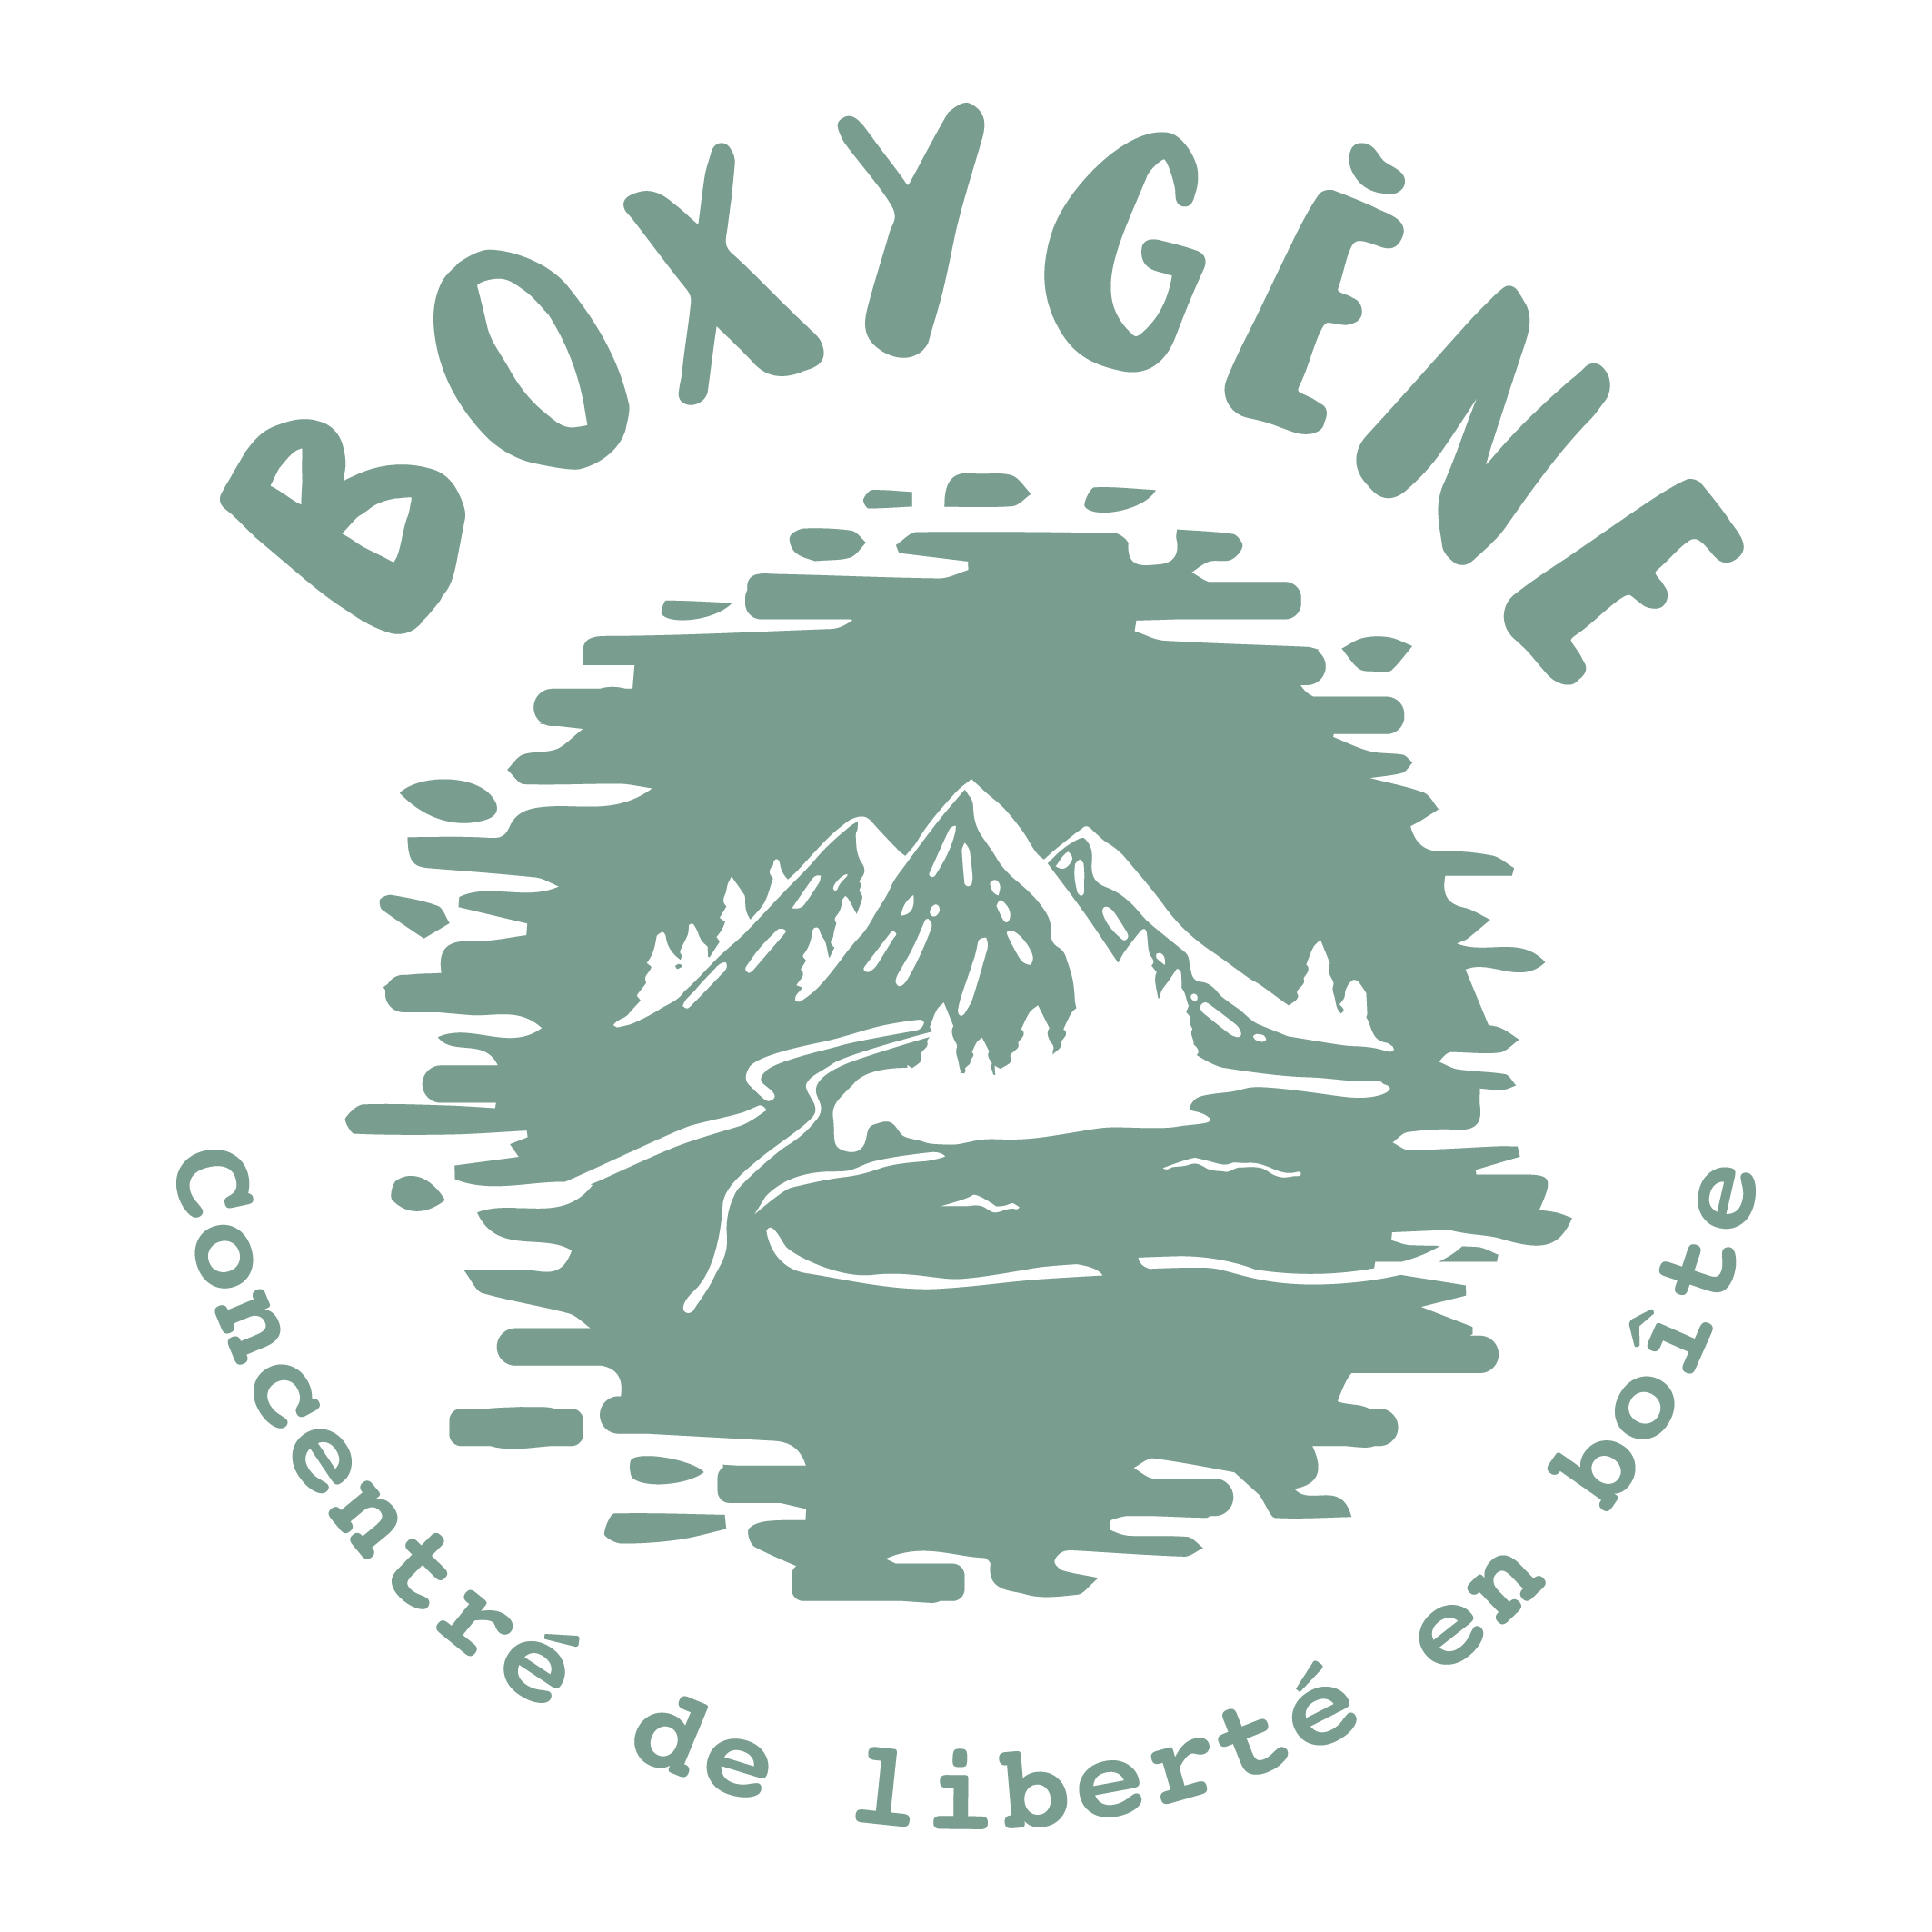 BOXYGENE-16-logo-1-RVB-couleur.png